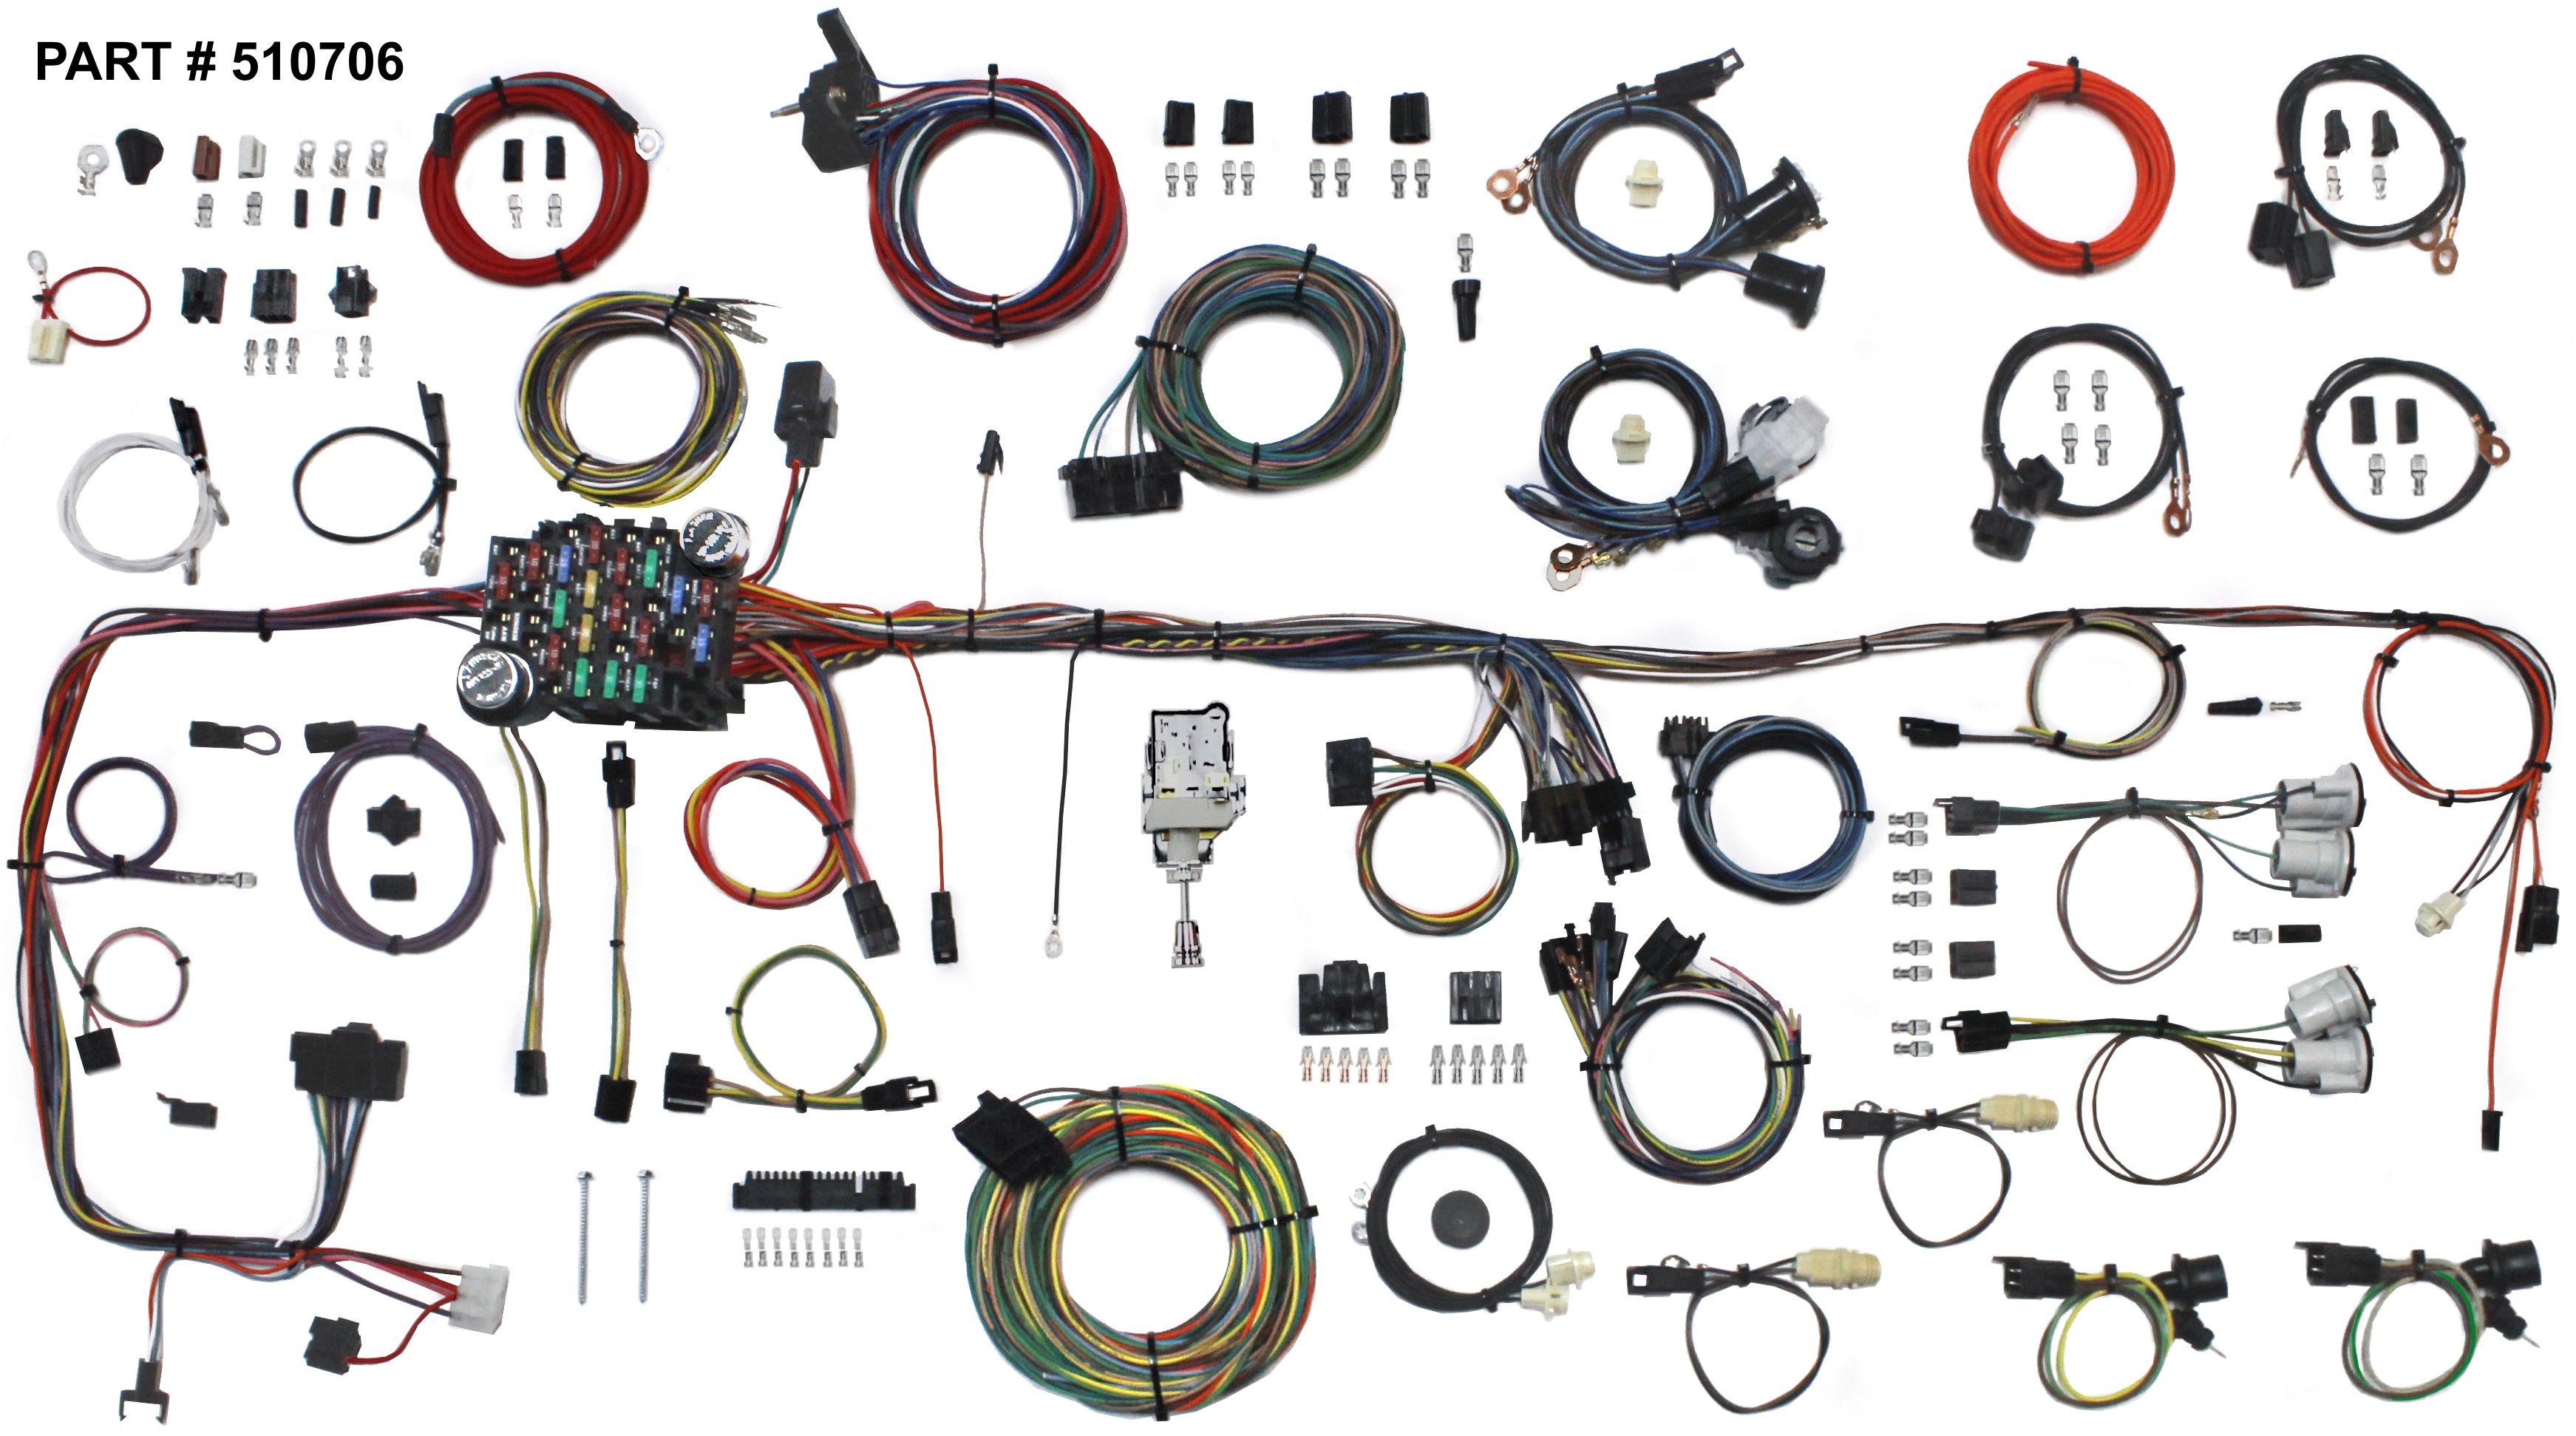 Wiring Harnes Chevy C10